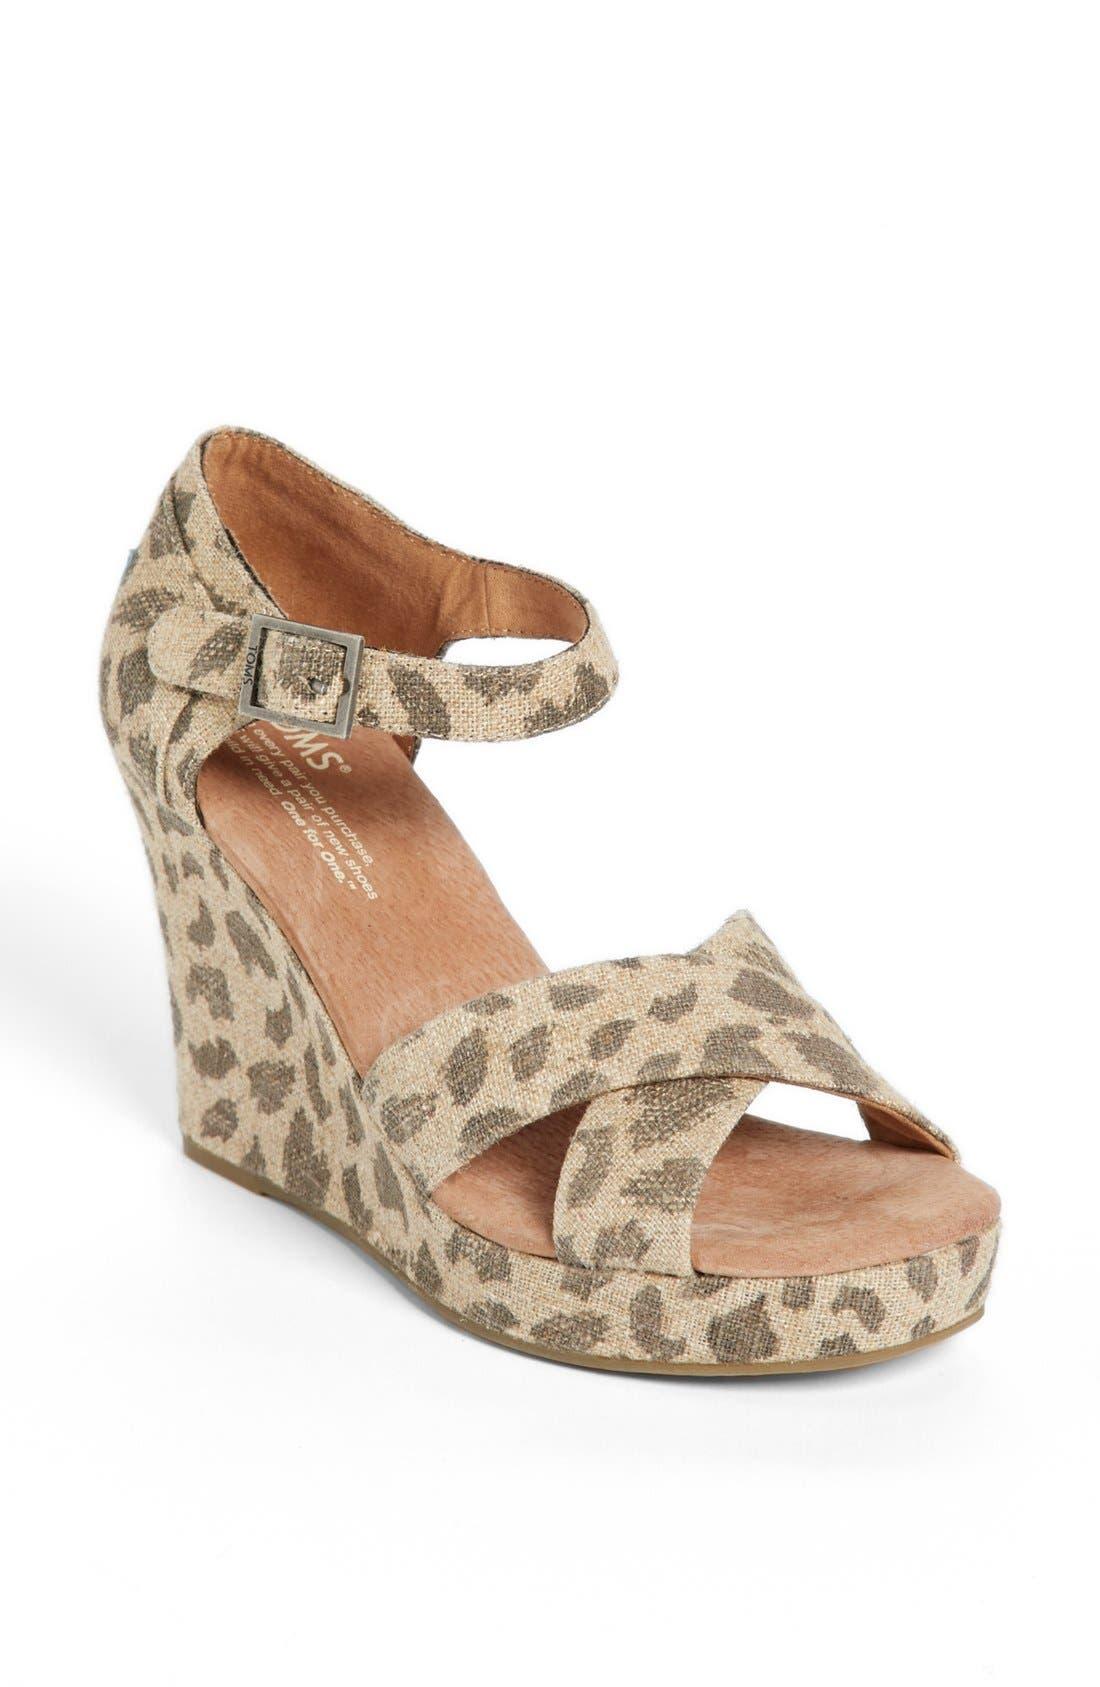 Main Image - TOMS 'Leopard' Wedge Sandal